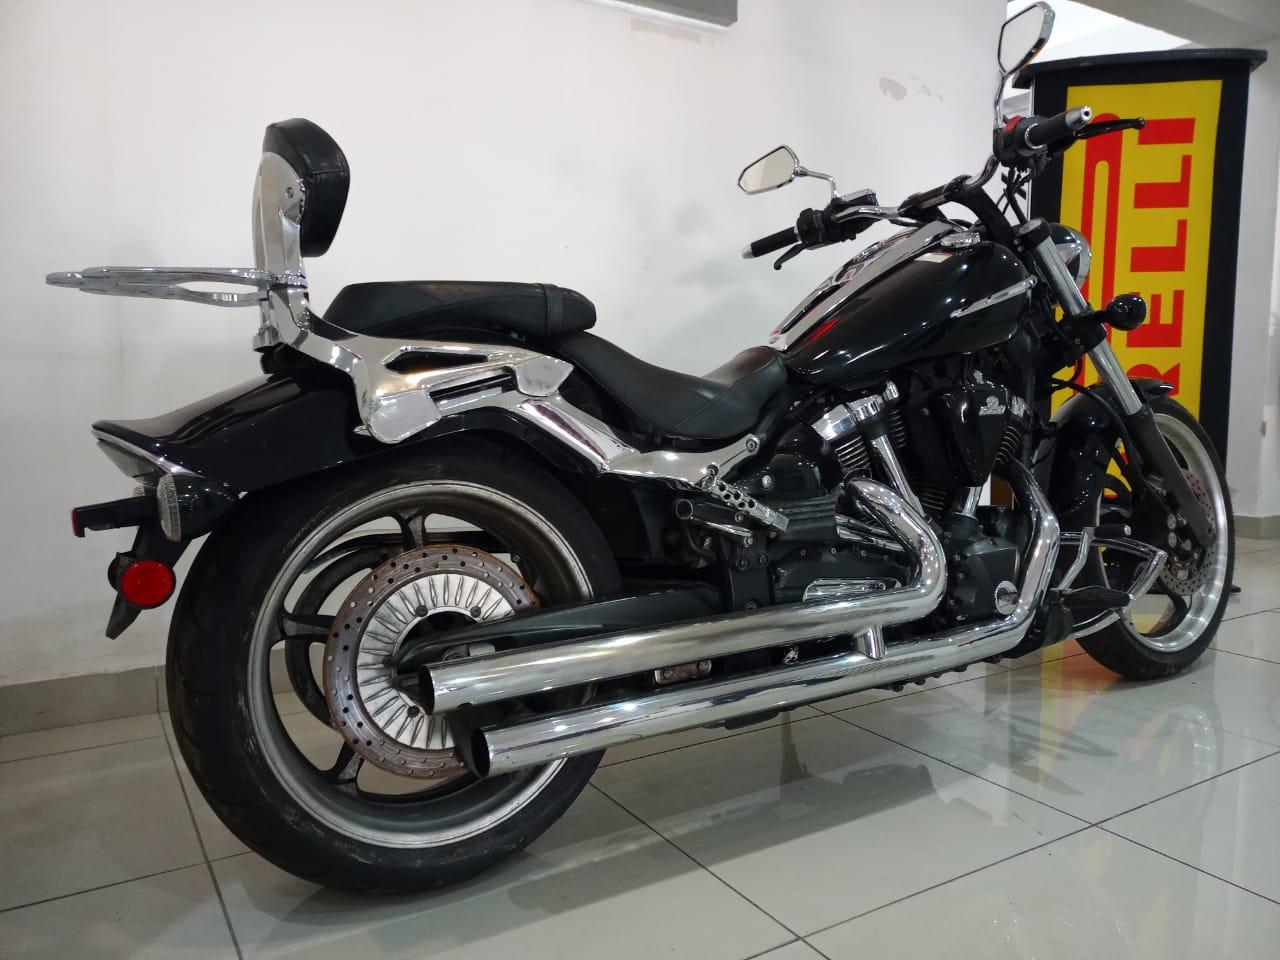 2008 Yamaha Chappy